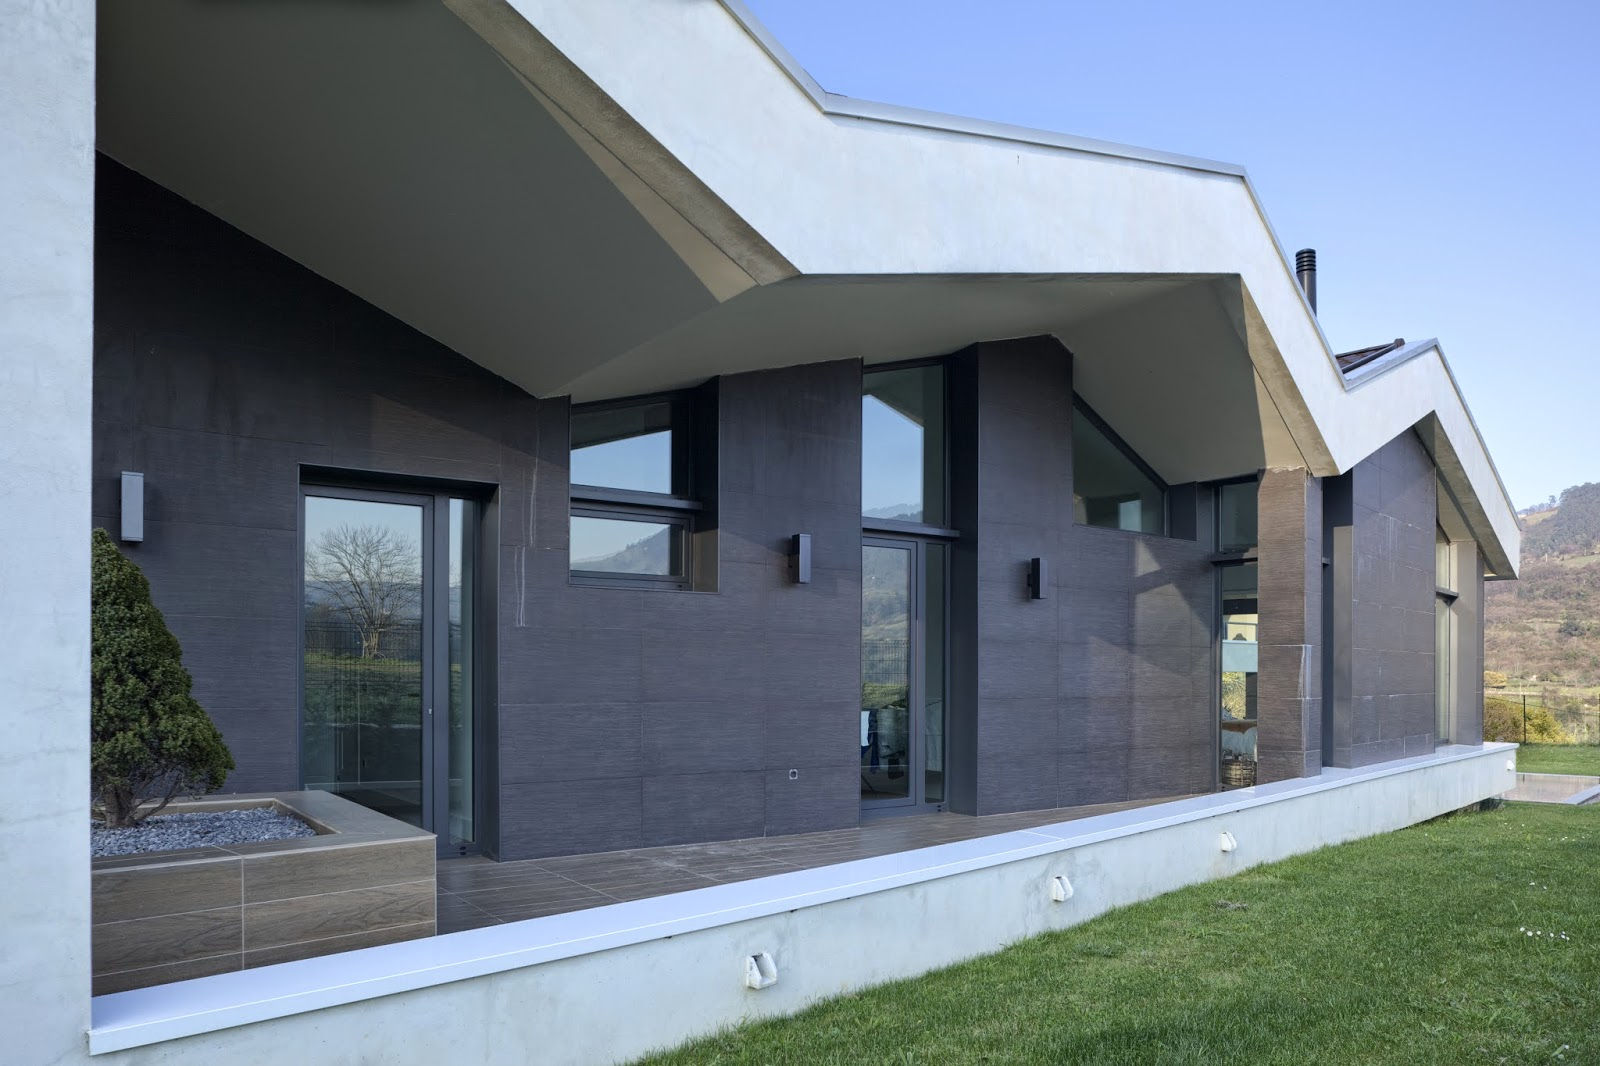 Casa vp pablo fern ndez fern ndez aib architecture obras - Arquitectos gijon ...